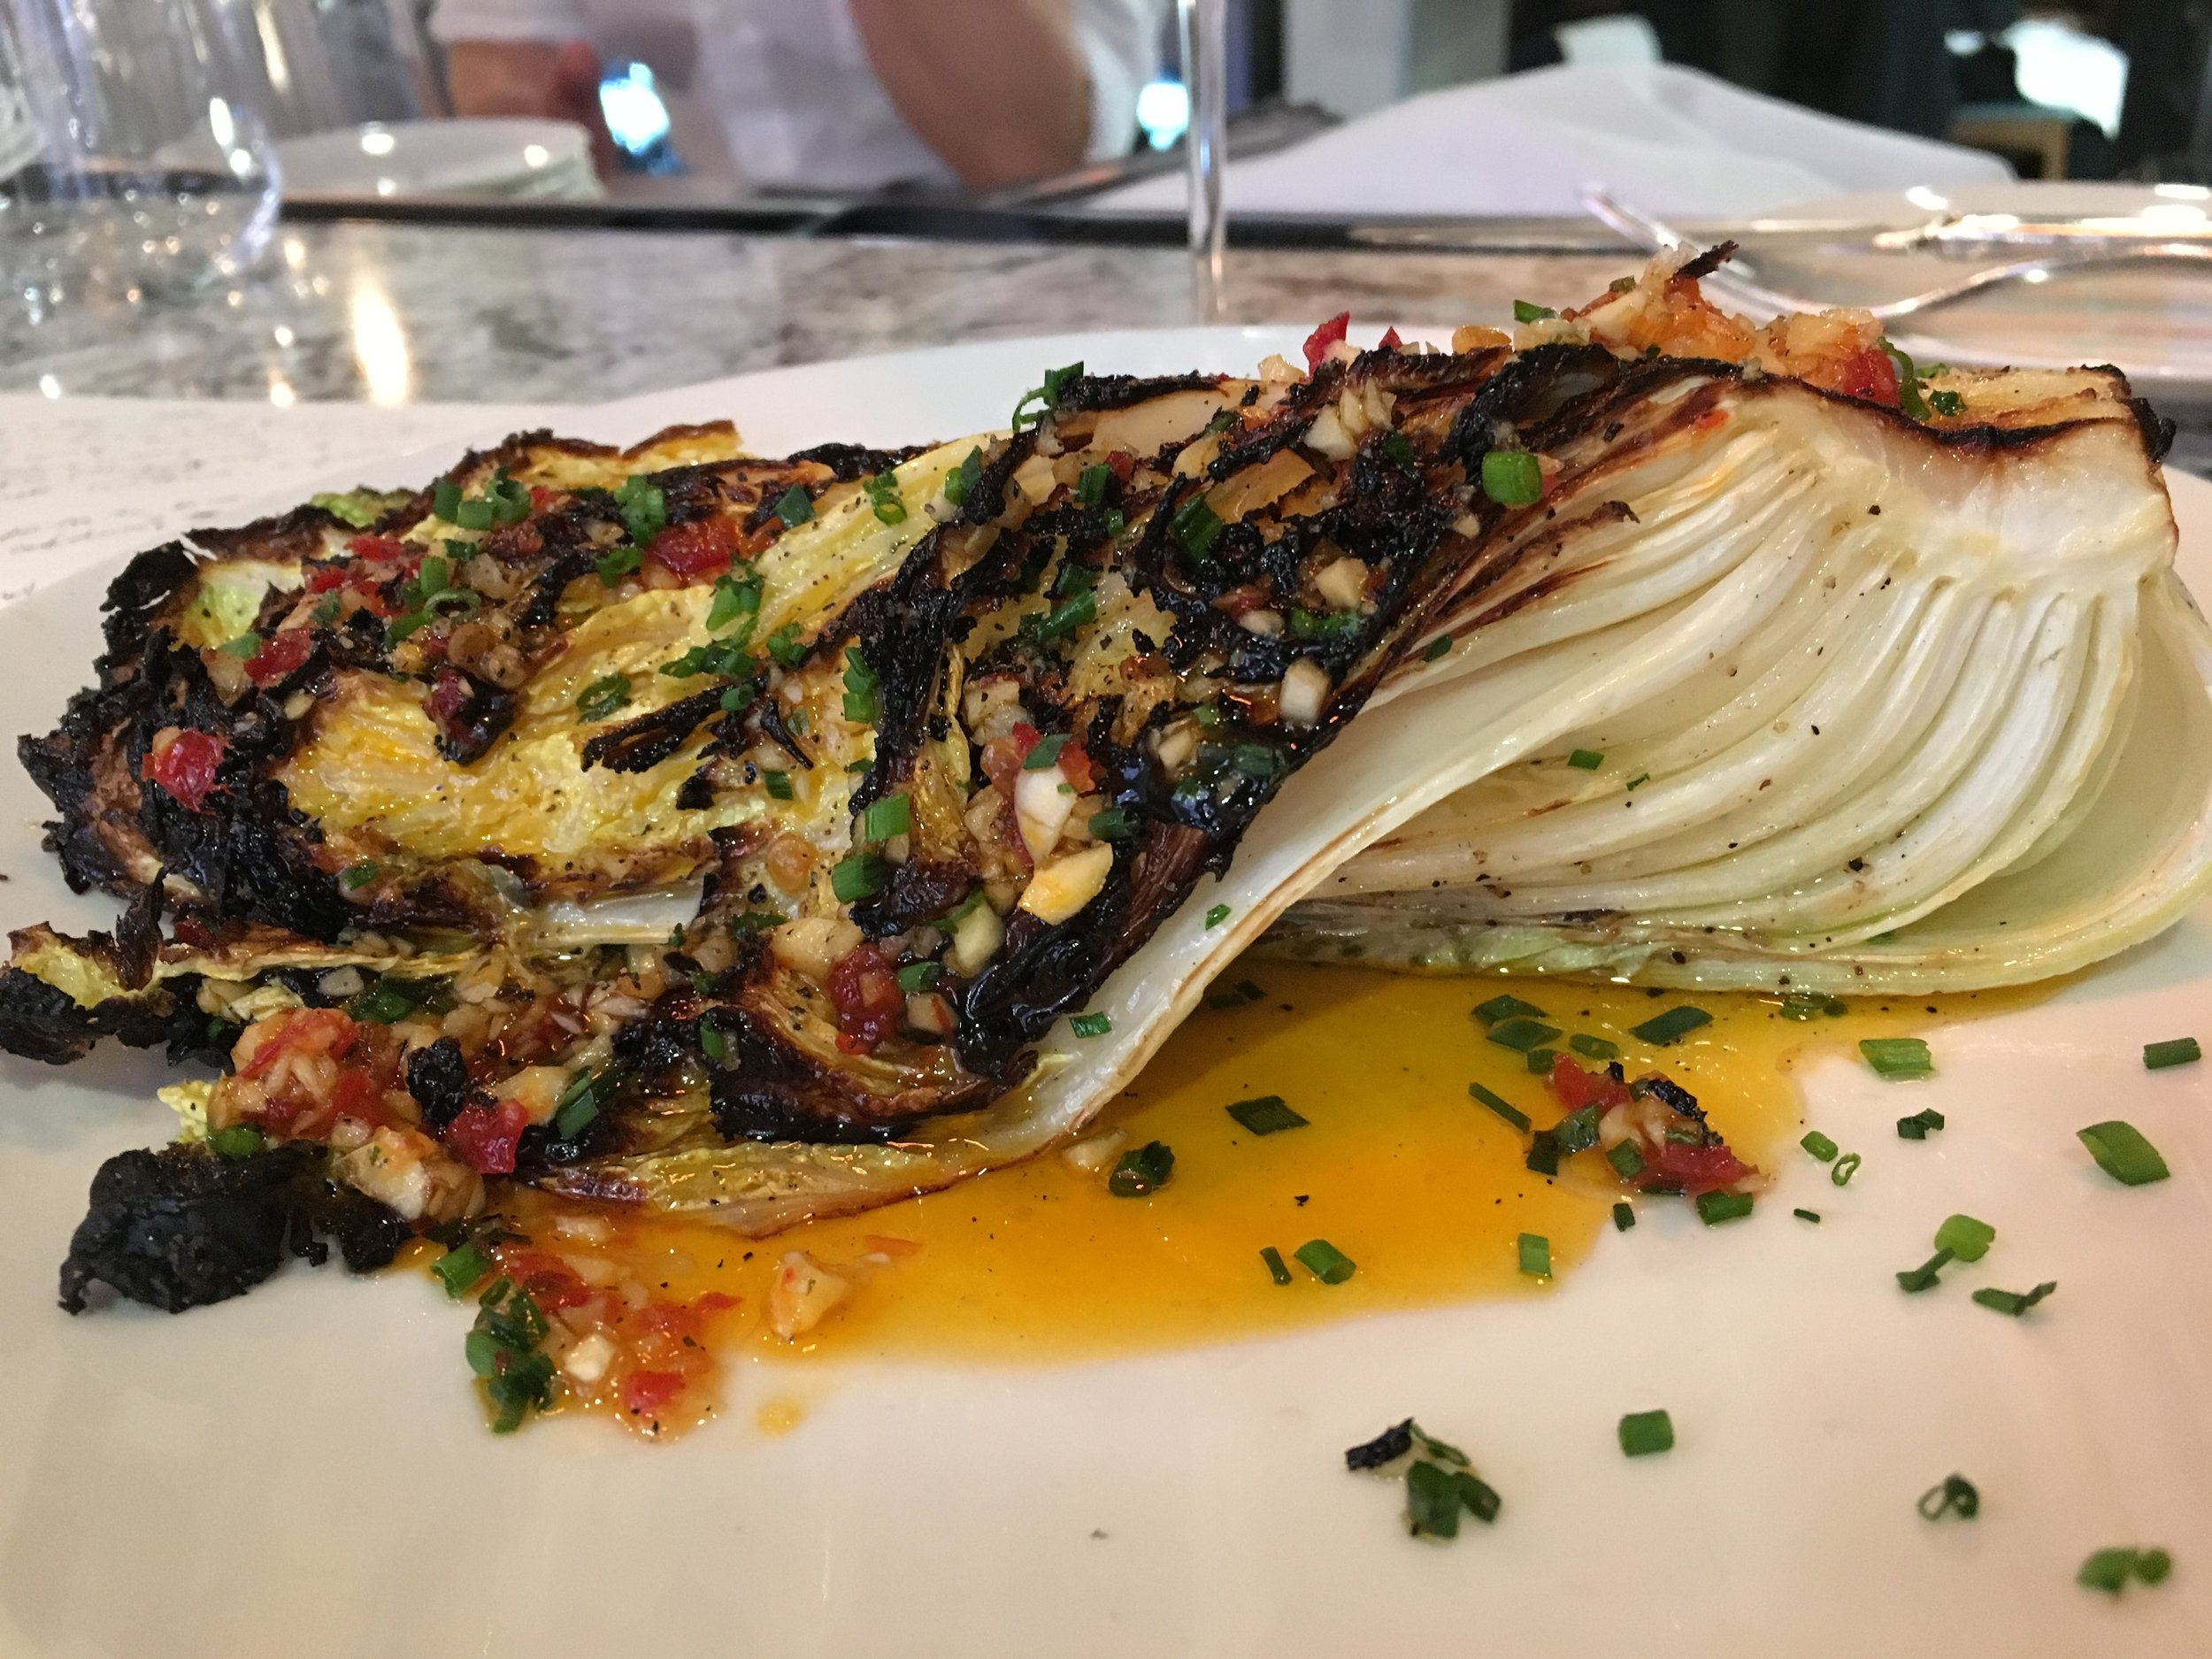 Cabbage rebooted. #realFood (Centrolina, Washington, DC)